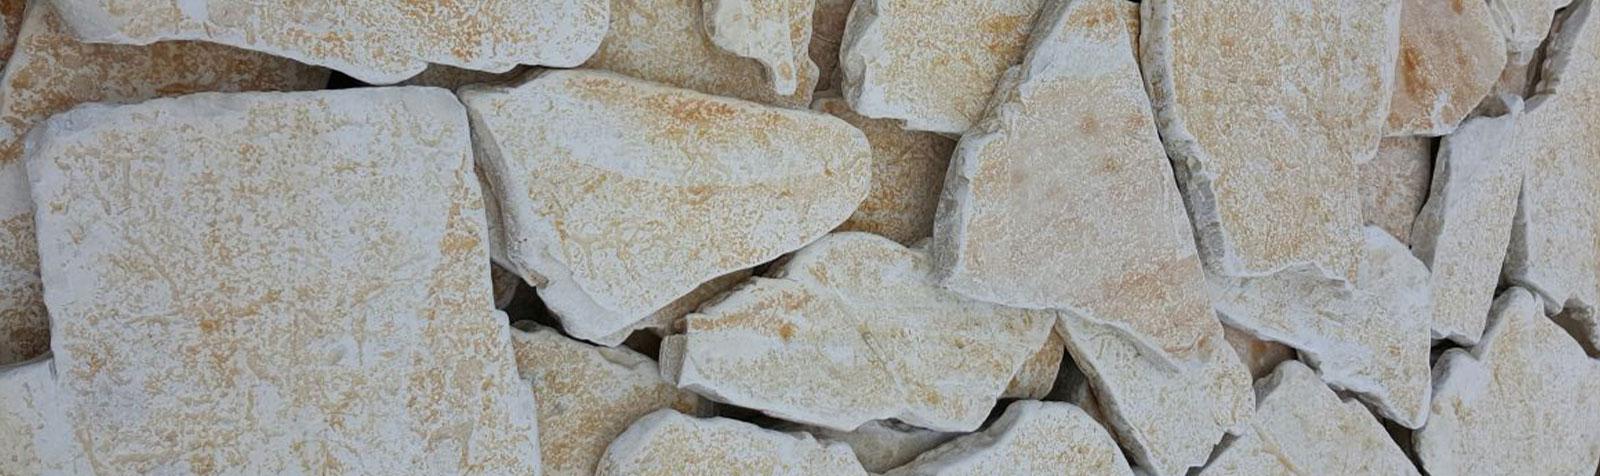 prirodni-kamen-Mediterran-bila